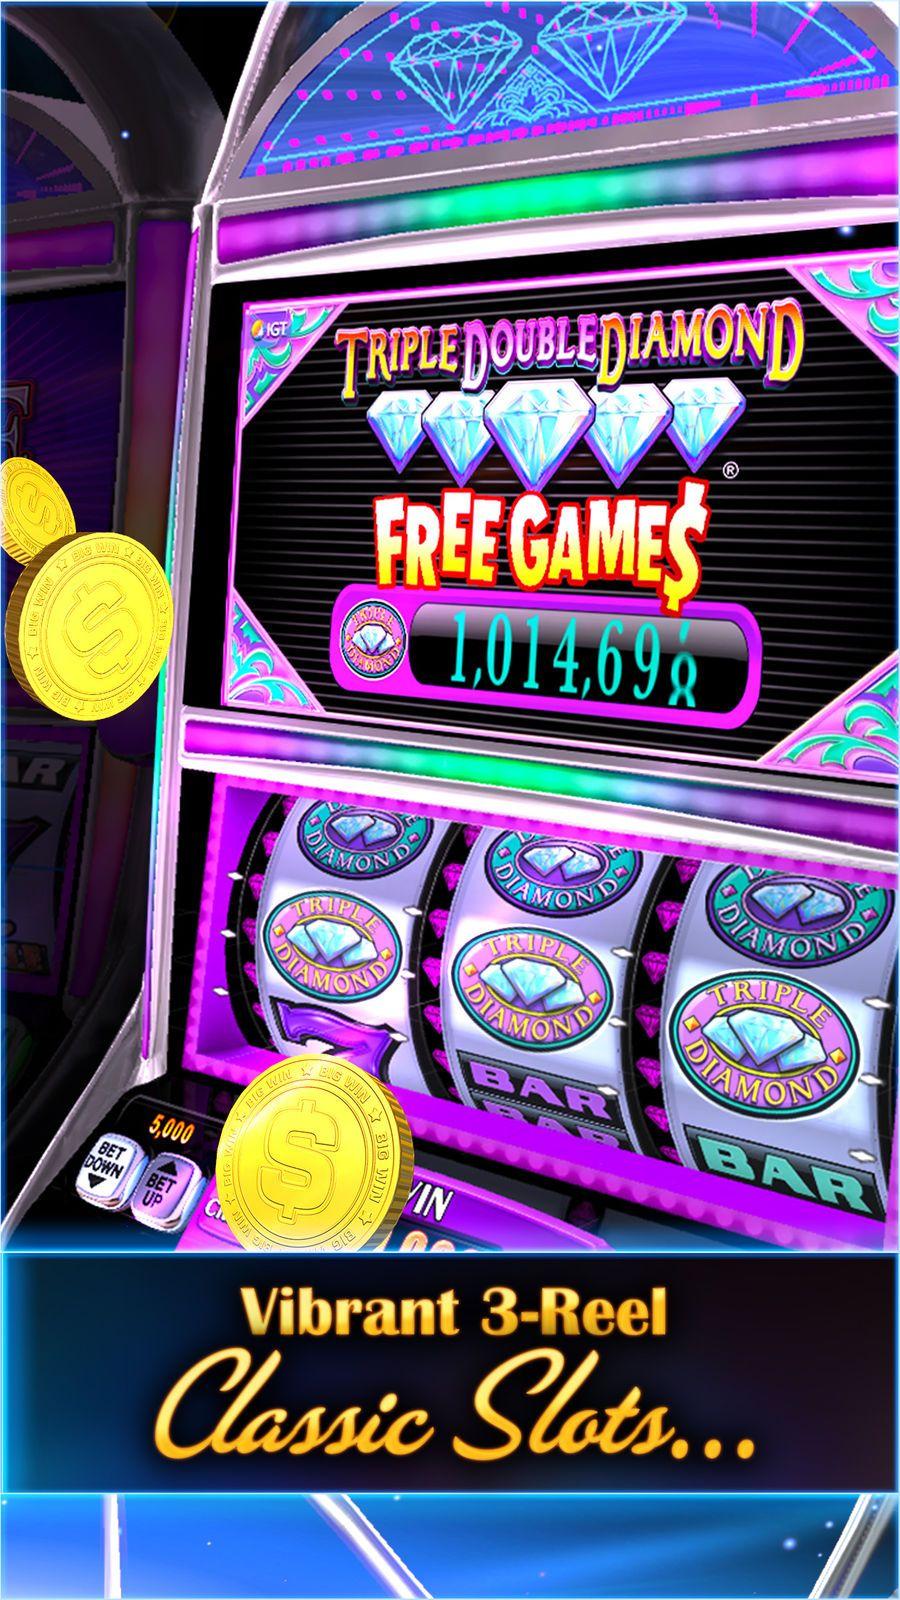 Thrills casino spelen jeugdbeweging spelendatabank